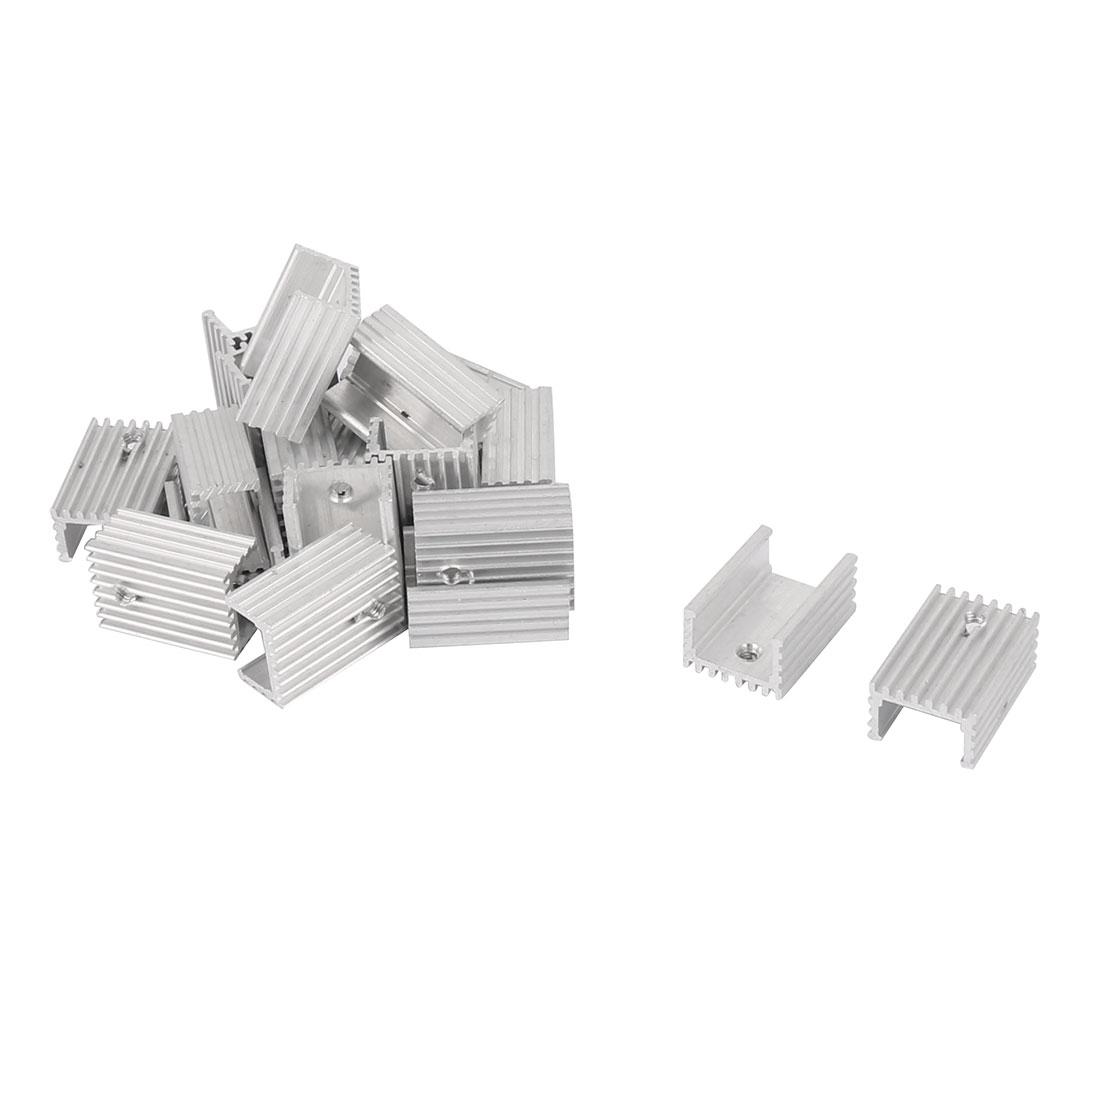 22mm x 15mm x 10mm Silver Tone Aluminium Power Amplifier Heat Sink Radiator Heatsink 20pcs